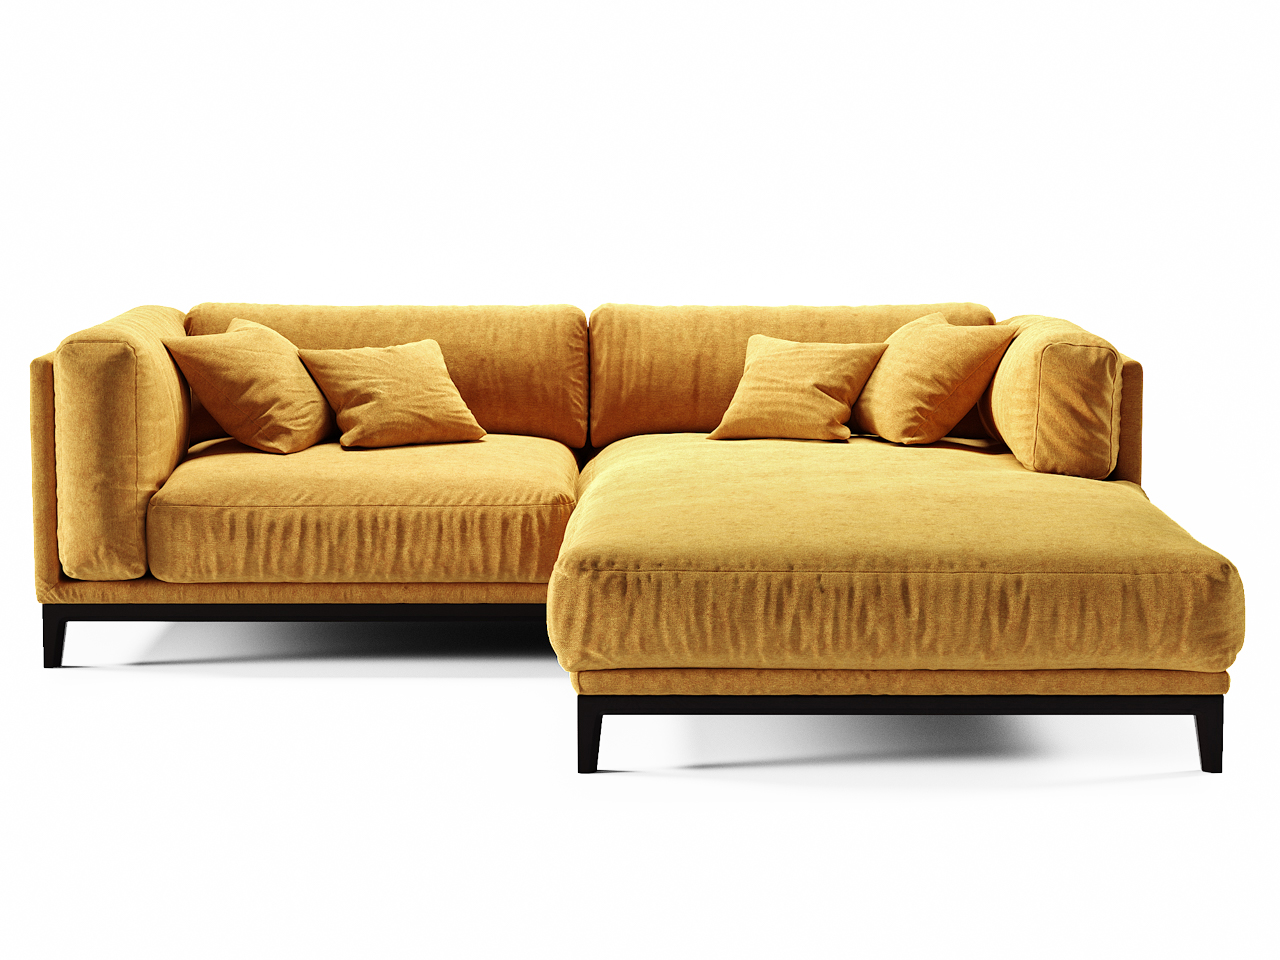 The idea диван case желтый 108436/6